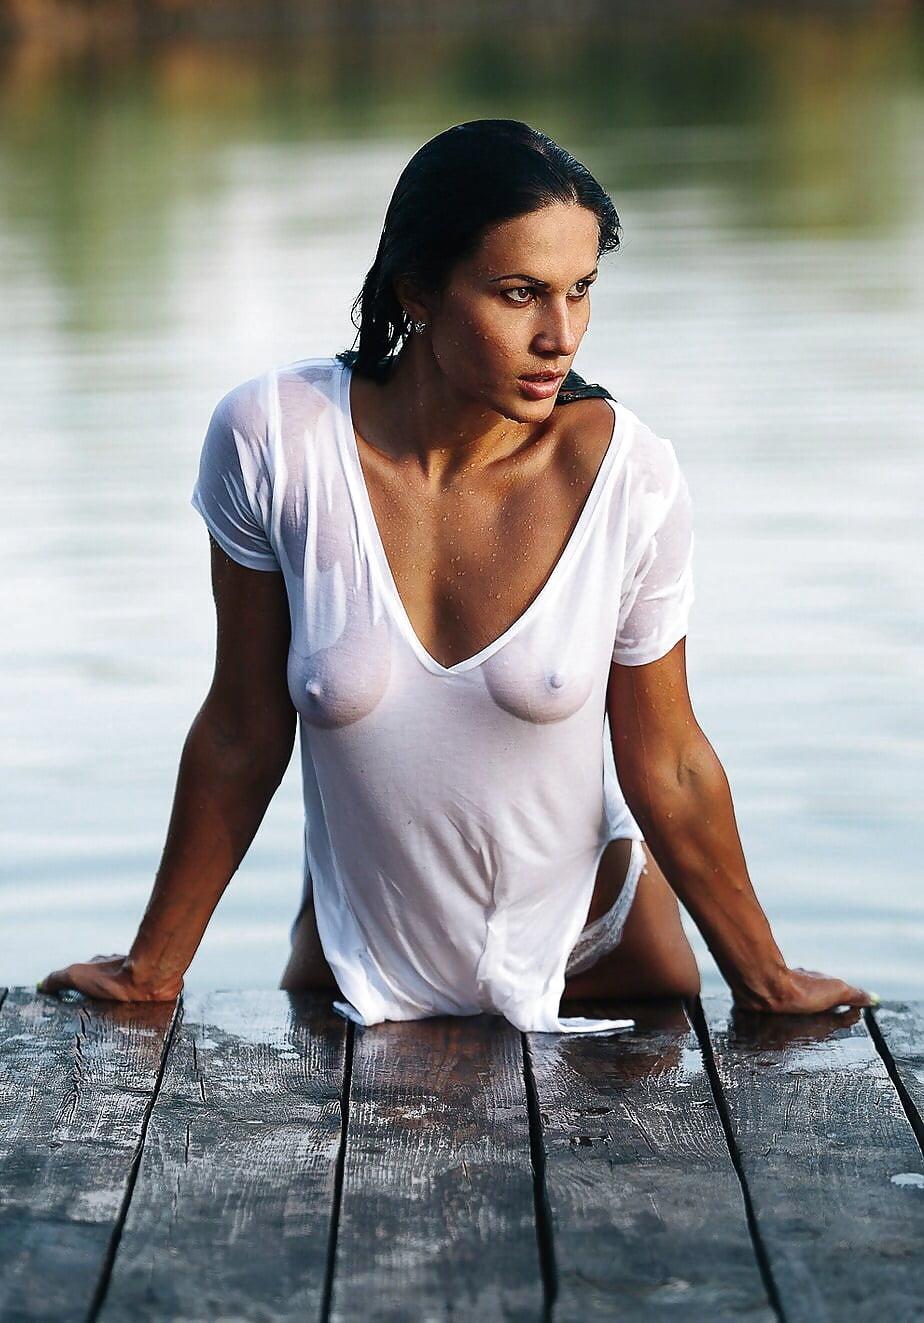 Sexy woman beach wet tshirt stock photo